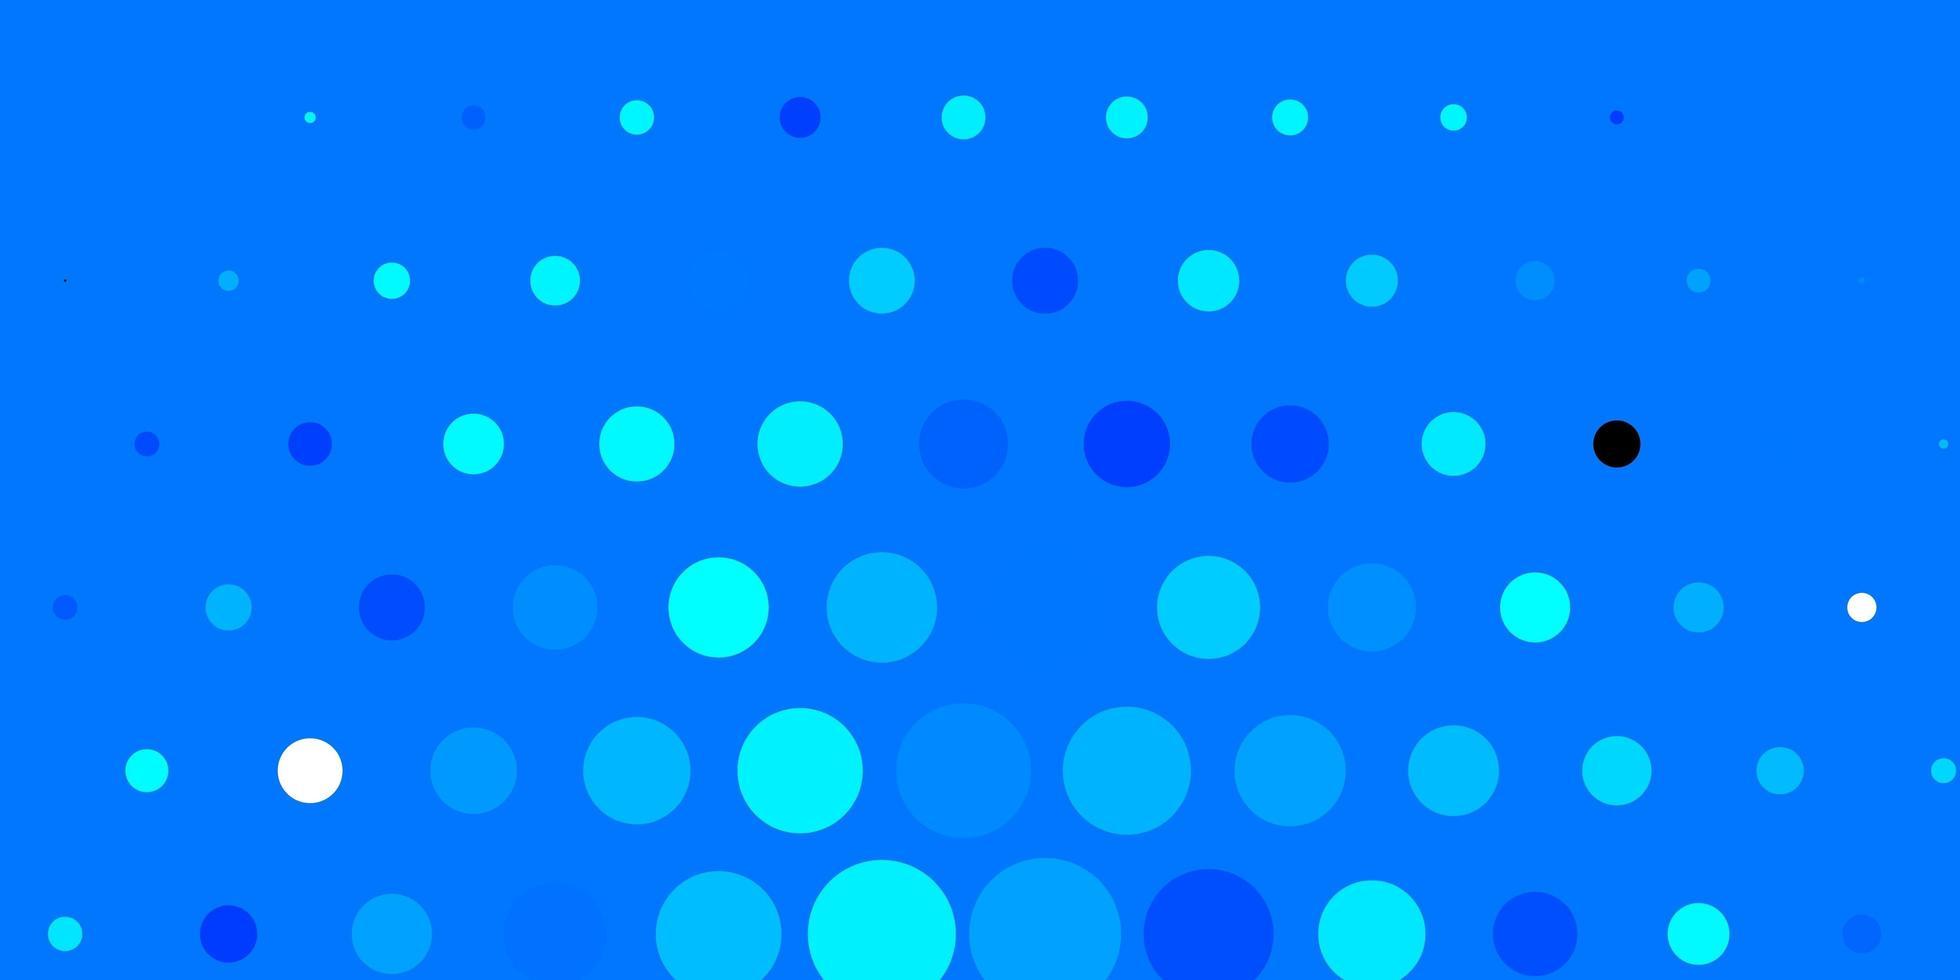 donkerblauwe vectorlay-out met cirkelvormen. vector